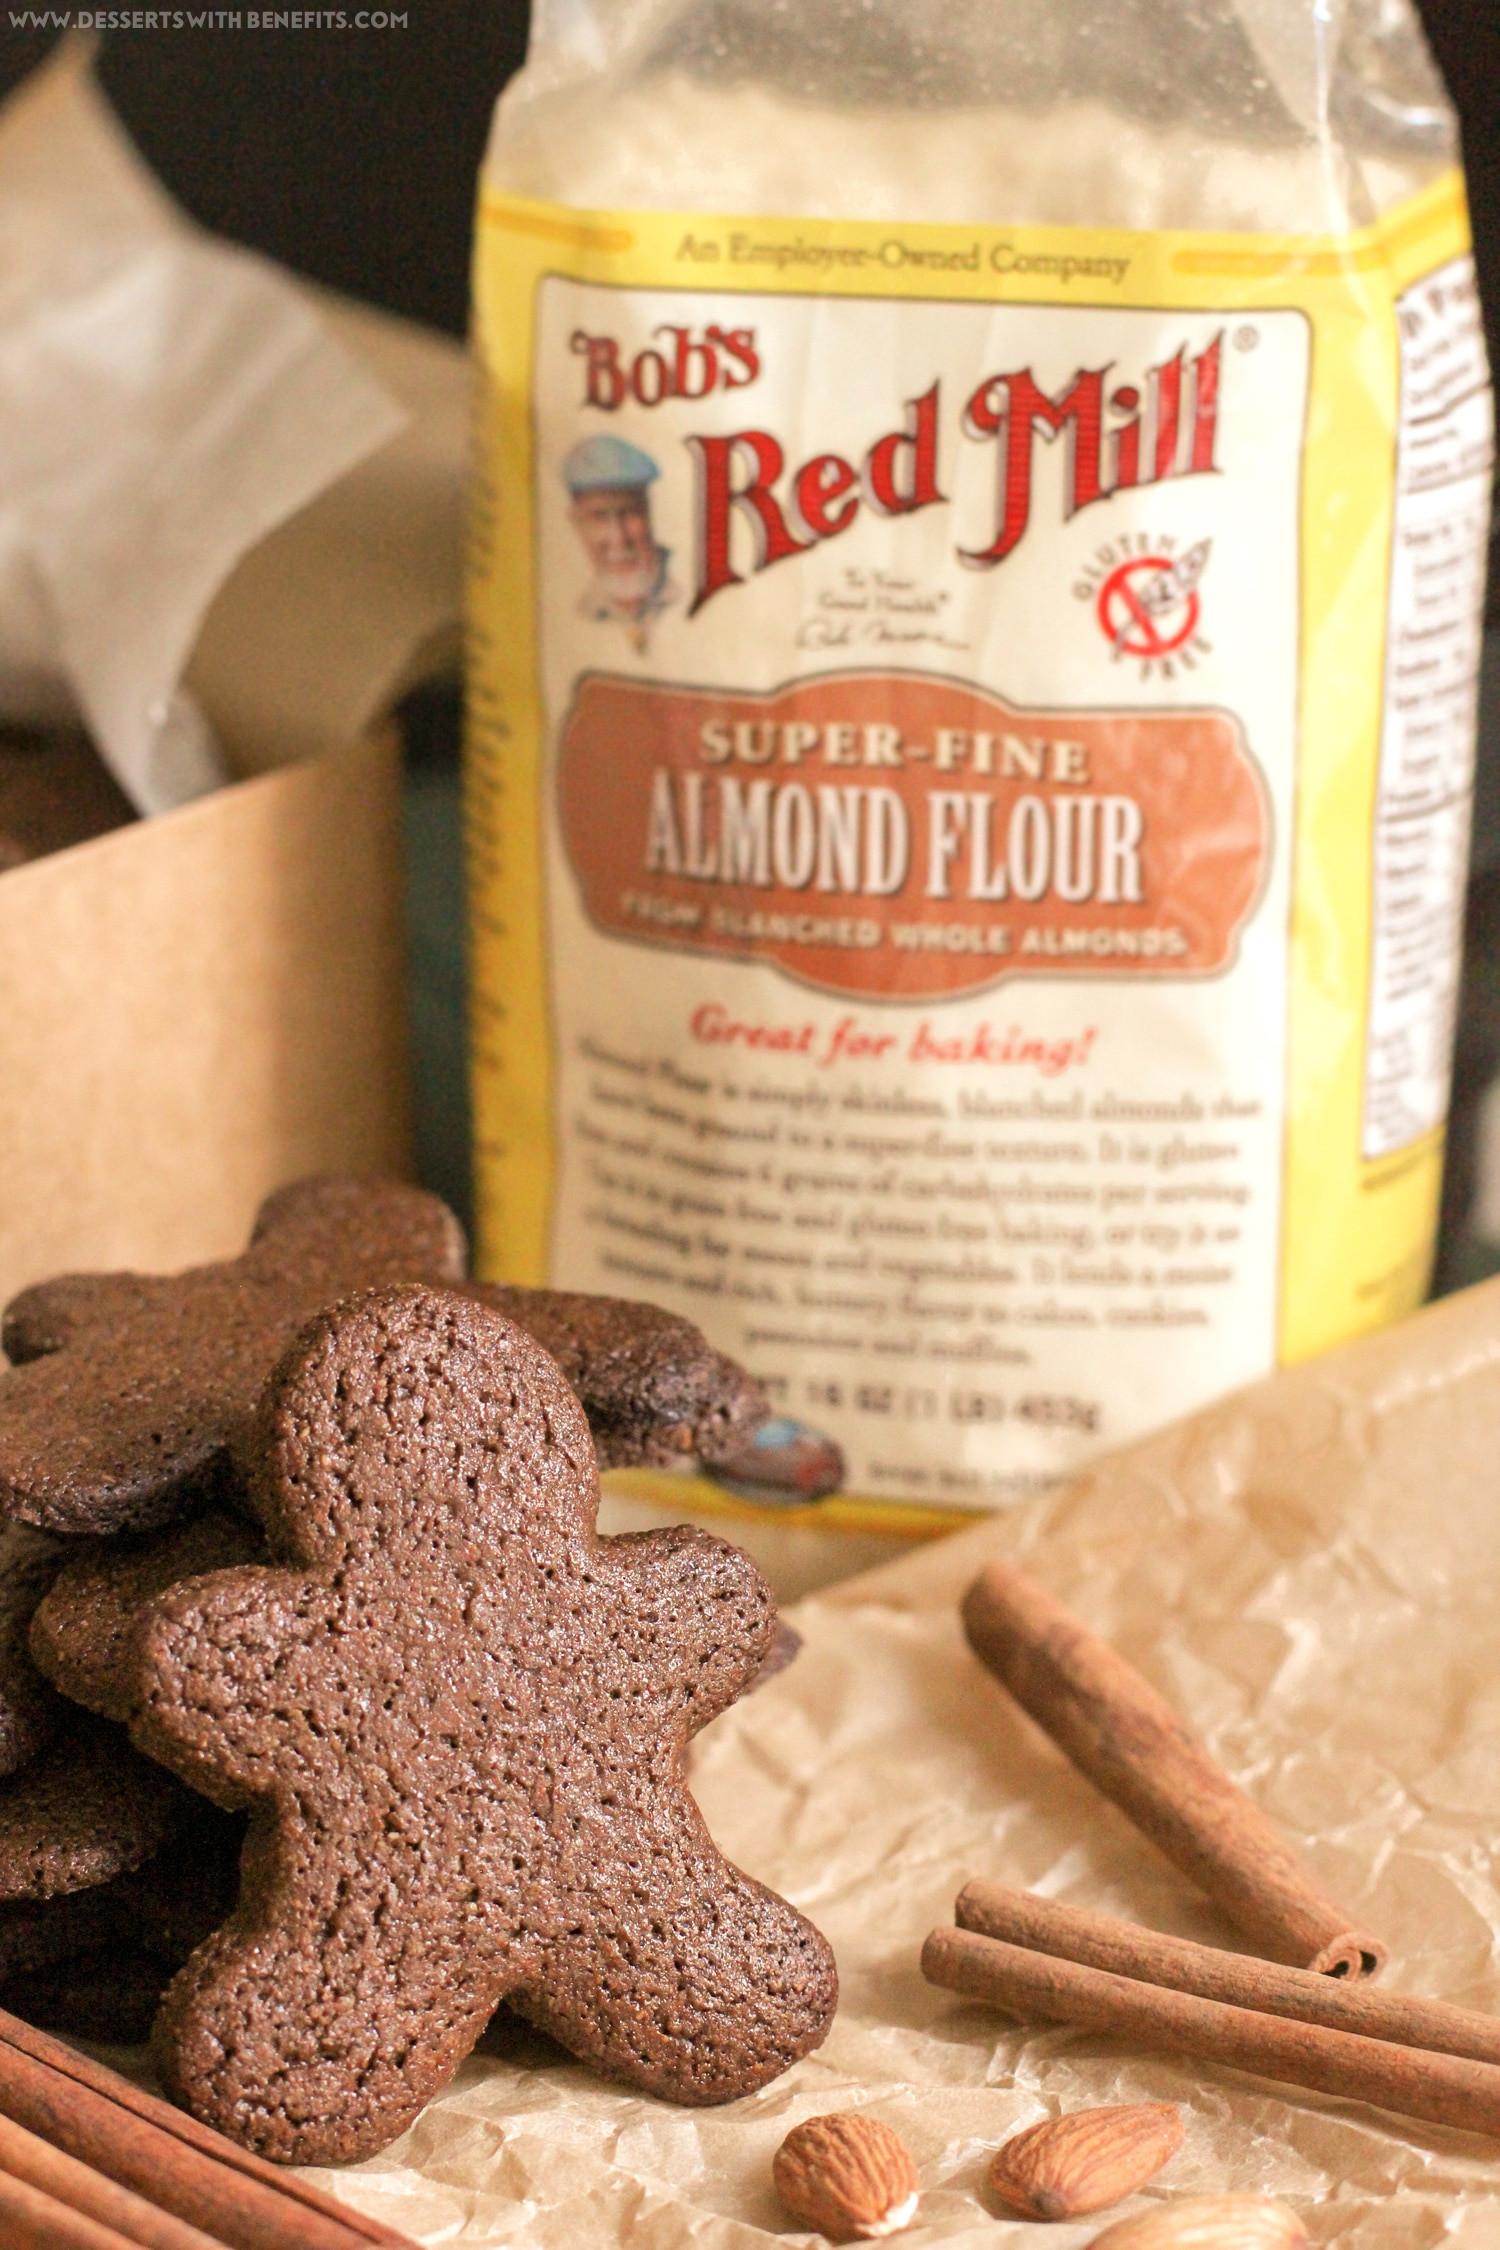 Sugar Free Gluten Free Dessert  Desserts With Benefits Healthy Gingerbread Cookies recipe